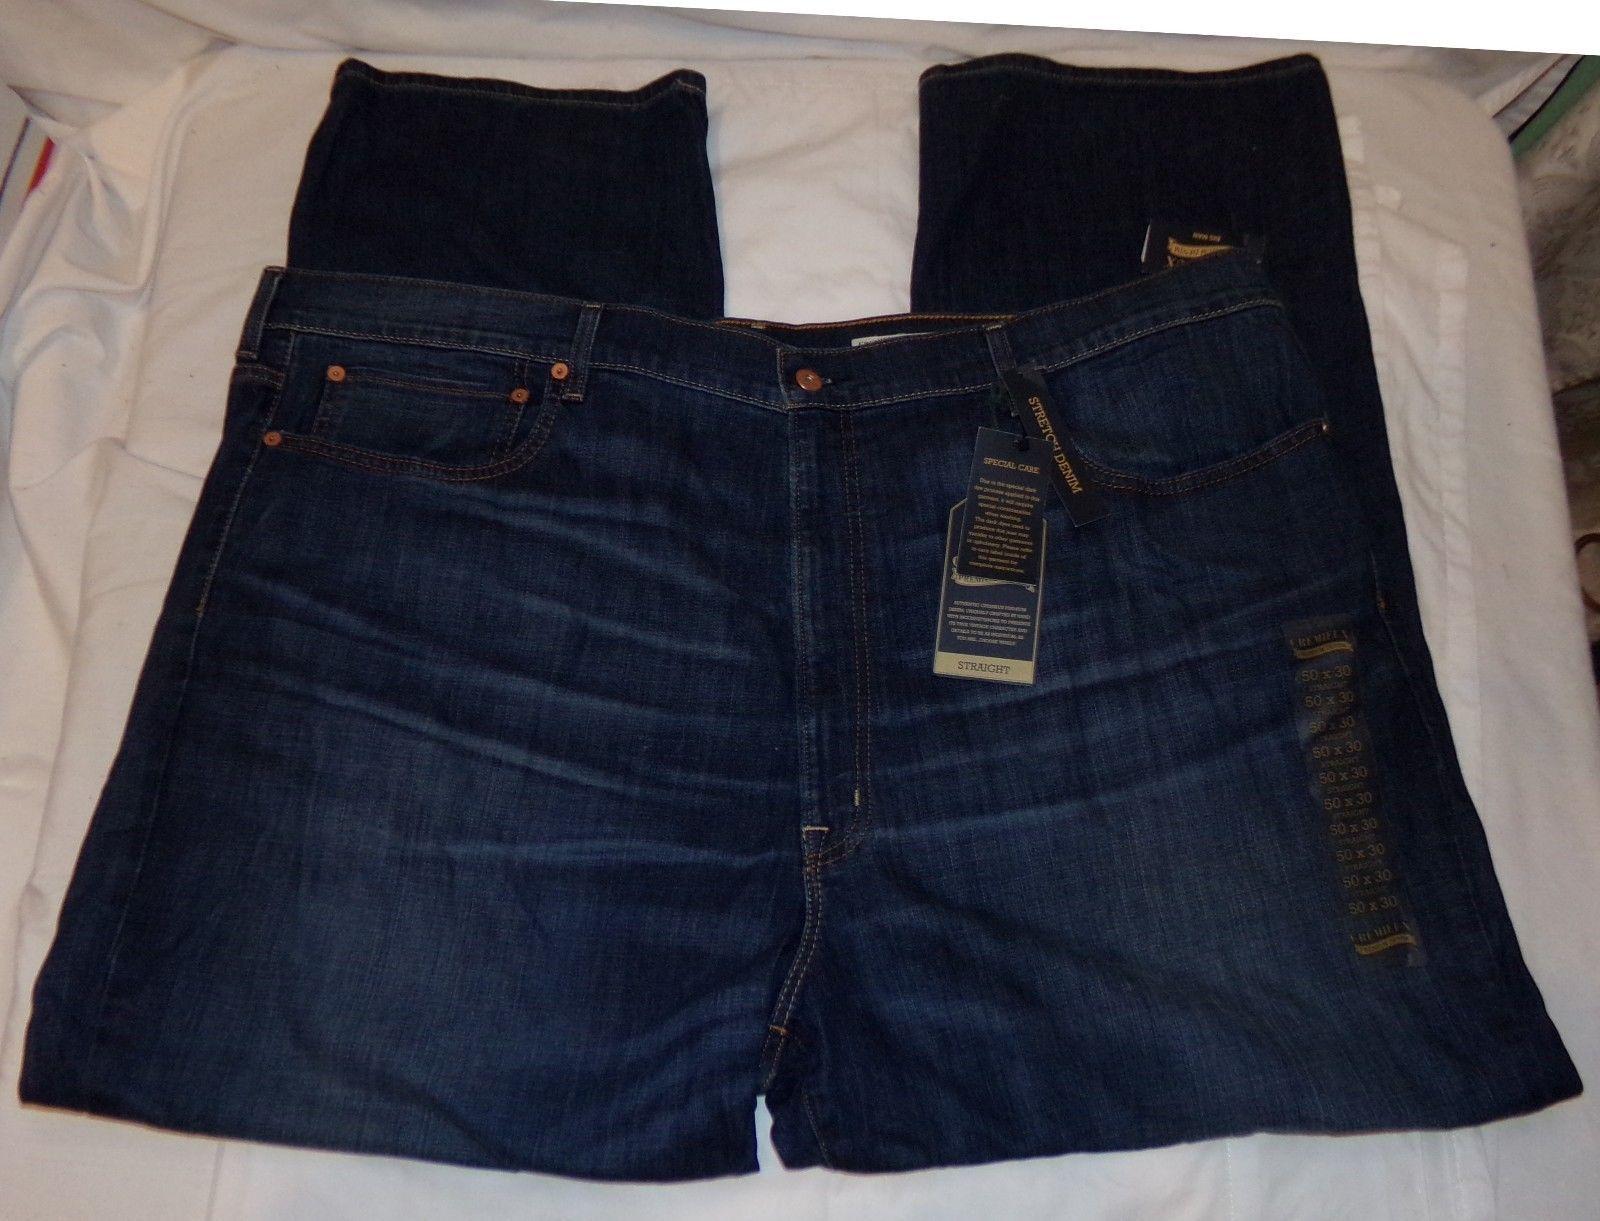 2cb02c61203 Cremieux Straight Stretch Denim Jeans 50 x 30 Mens NWT New - $34.72